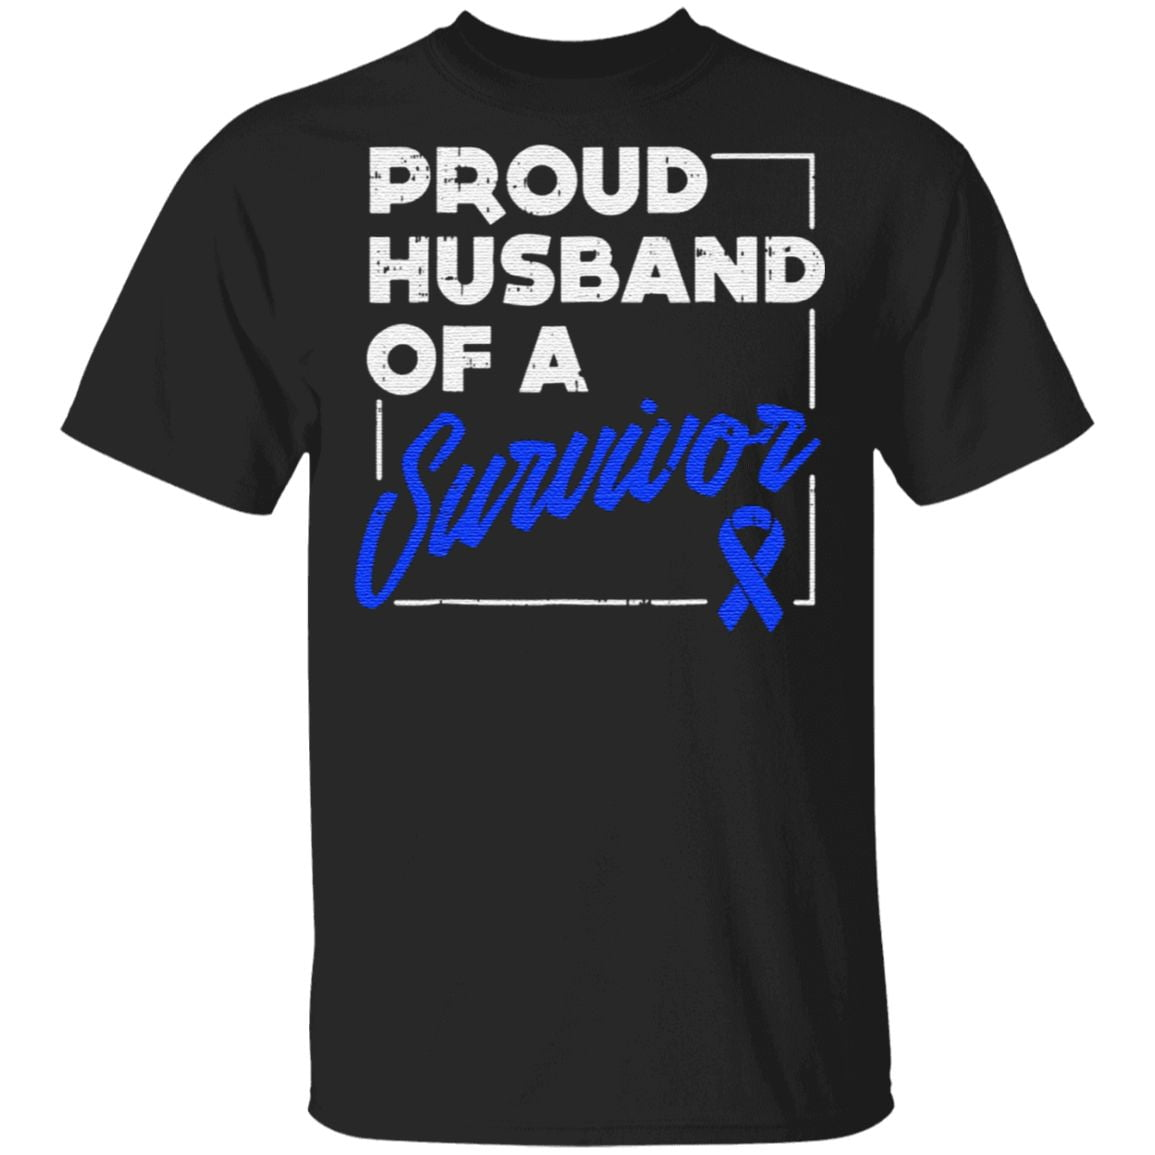 Proud Husband Of A Survivor TShirt